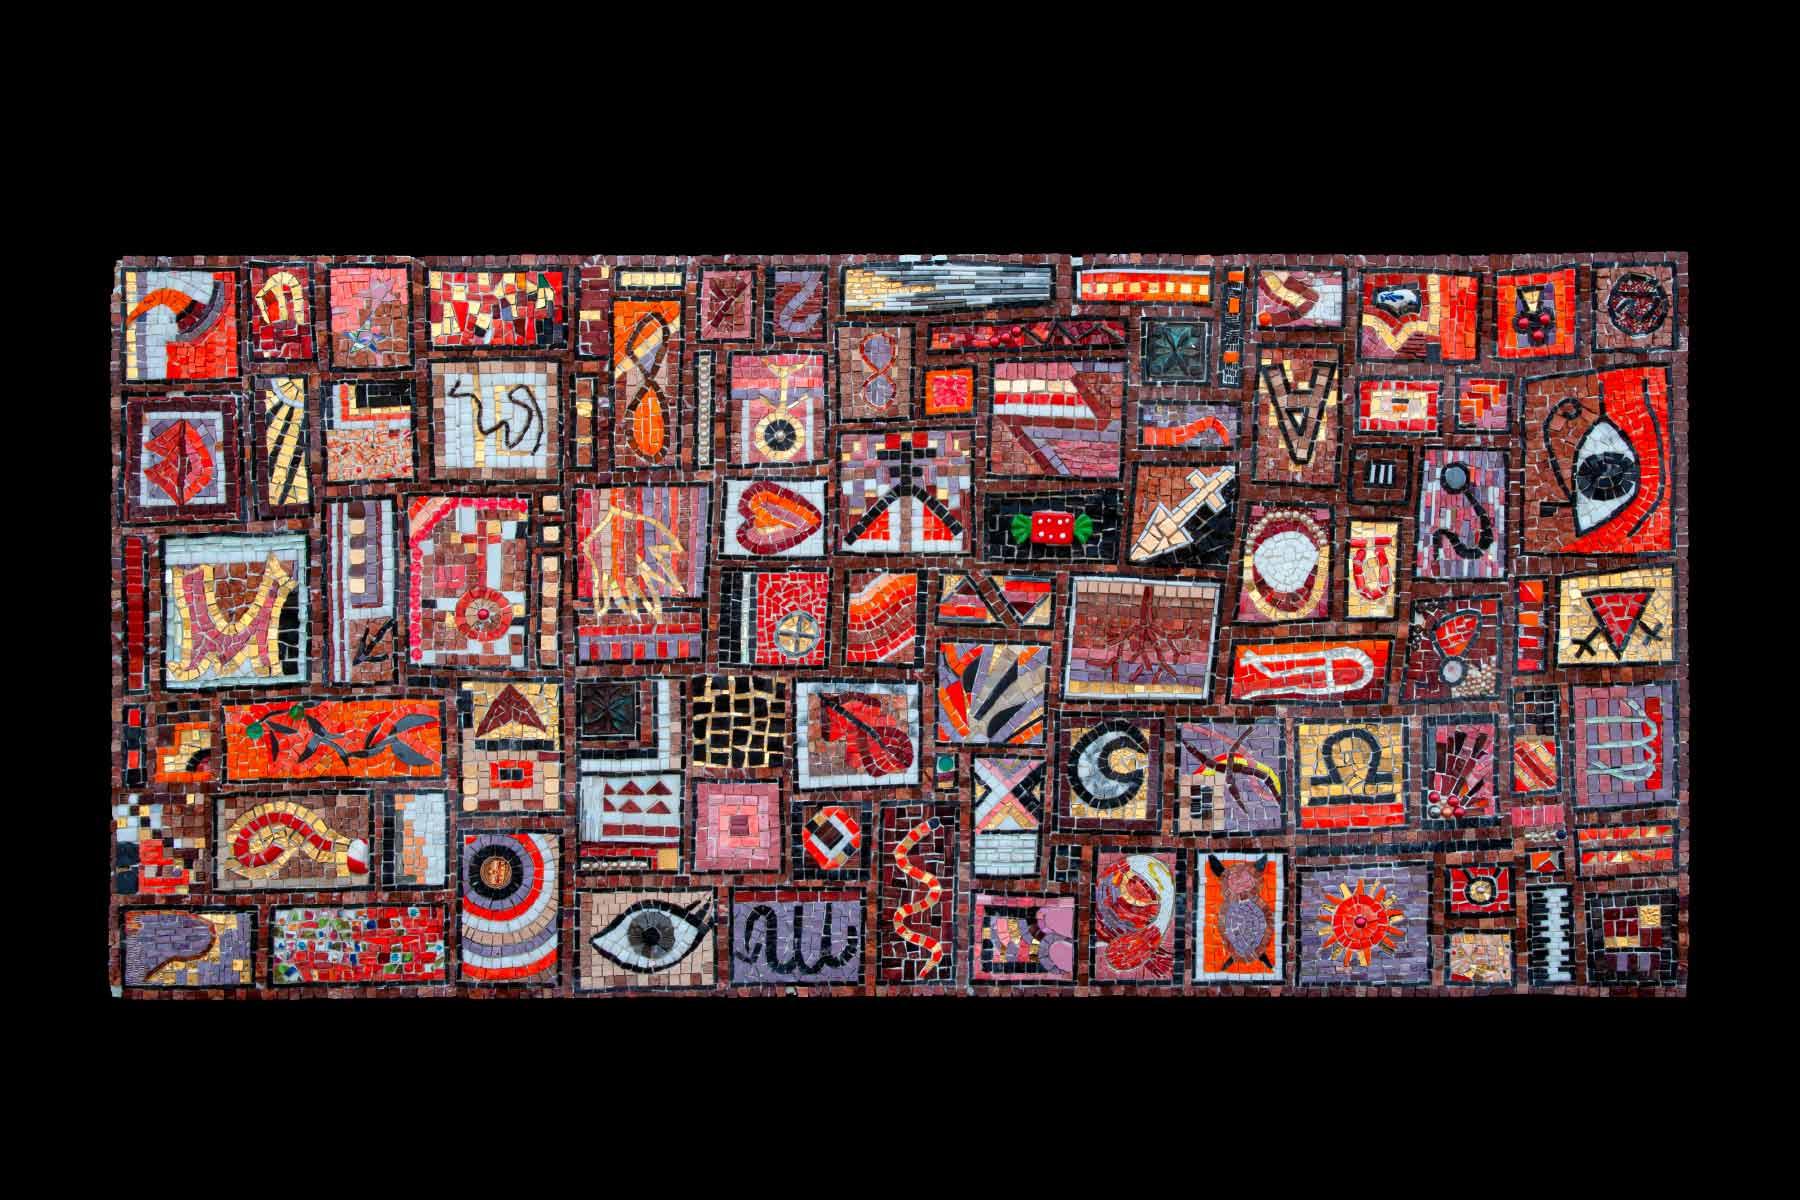 Ursula Corsi Red Autumn glass tiles stones